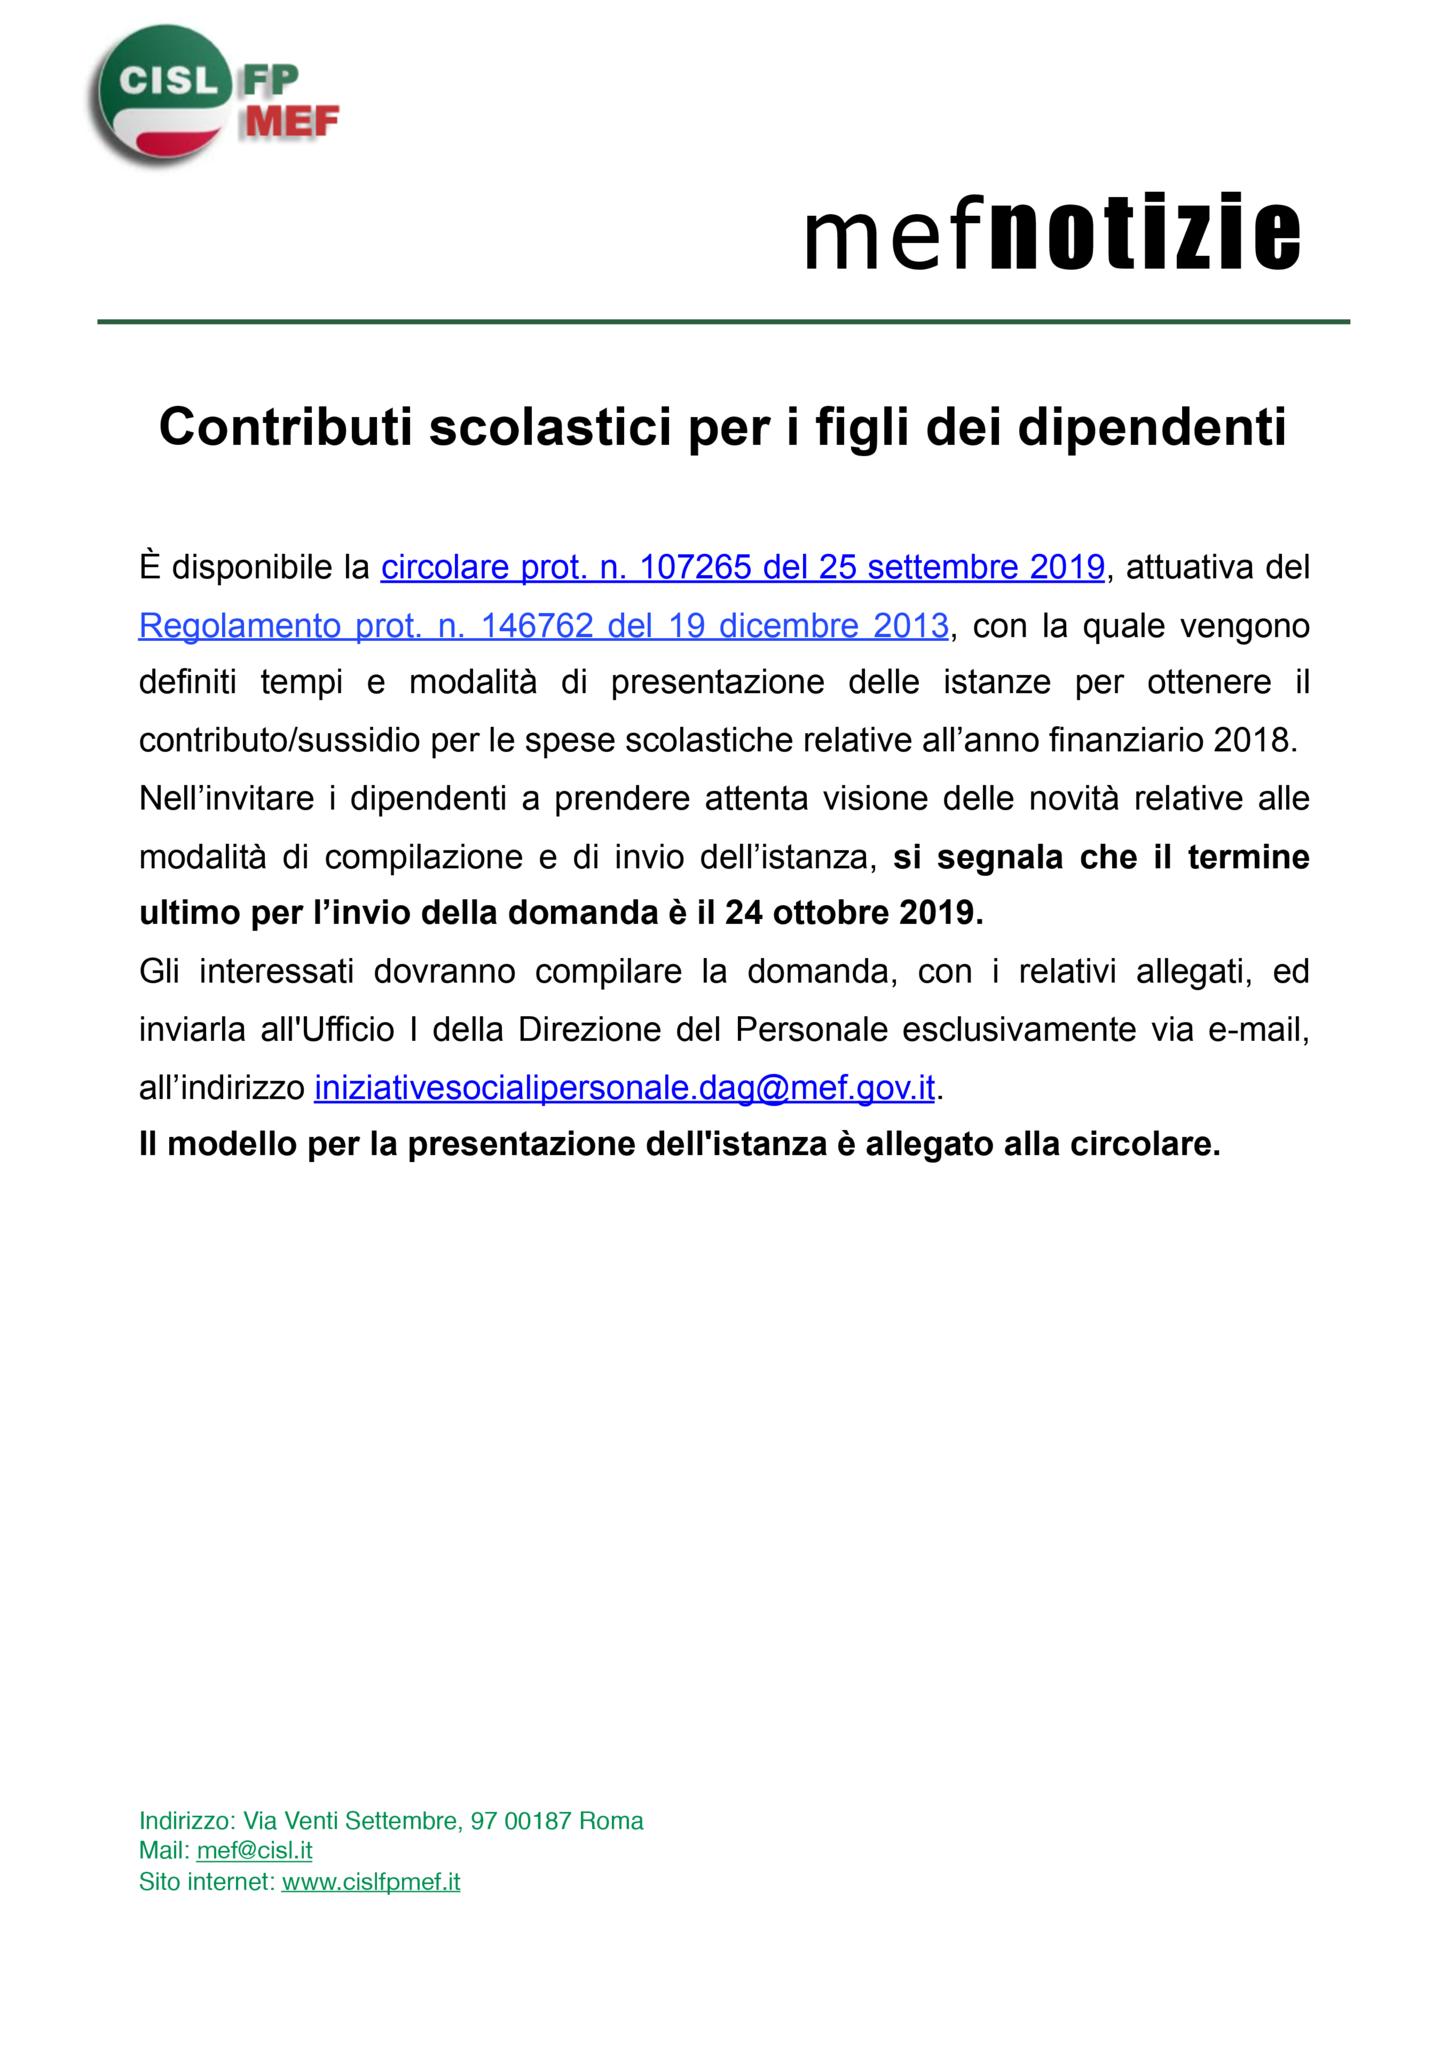 thumbnail of mef notizie – sussidi scolastici 2018